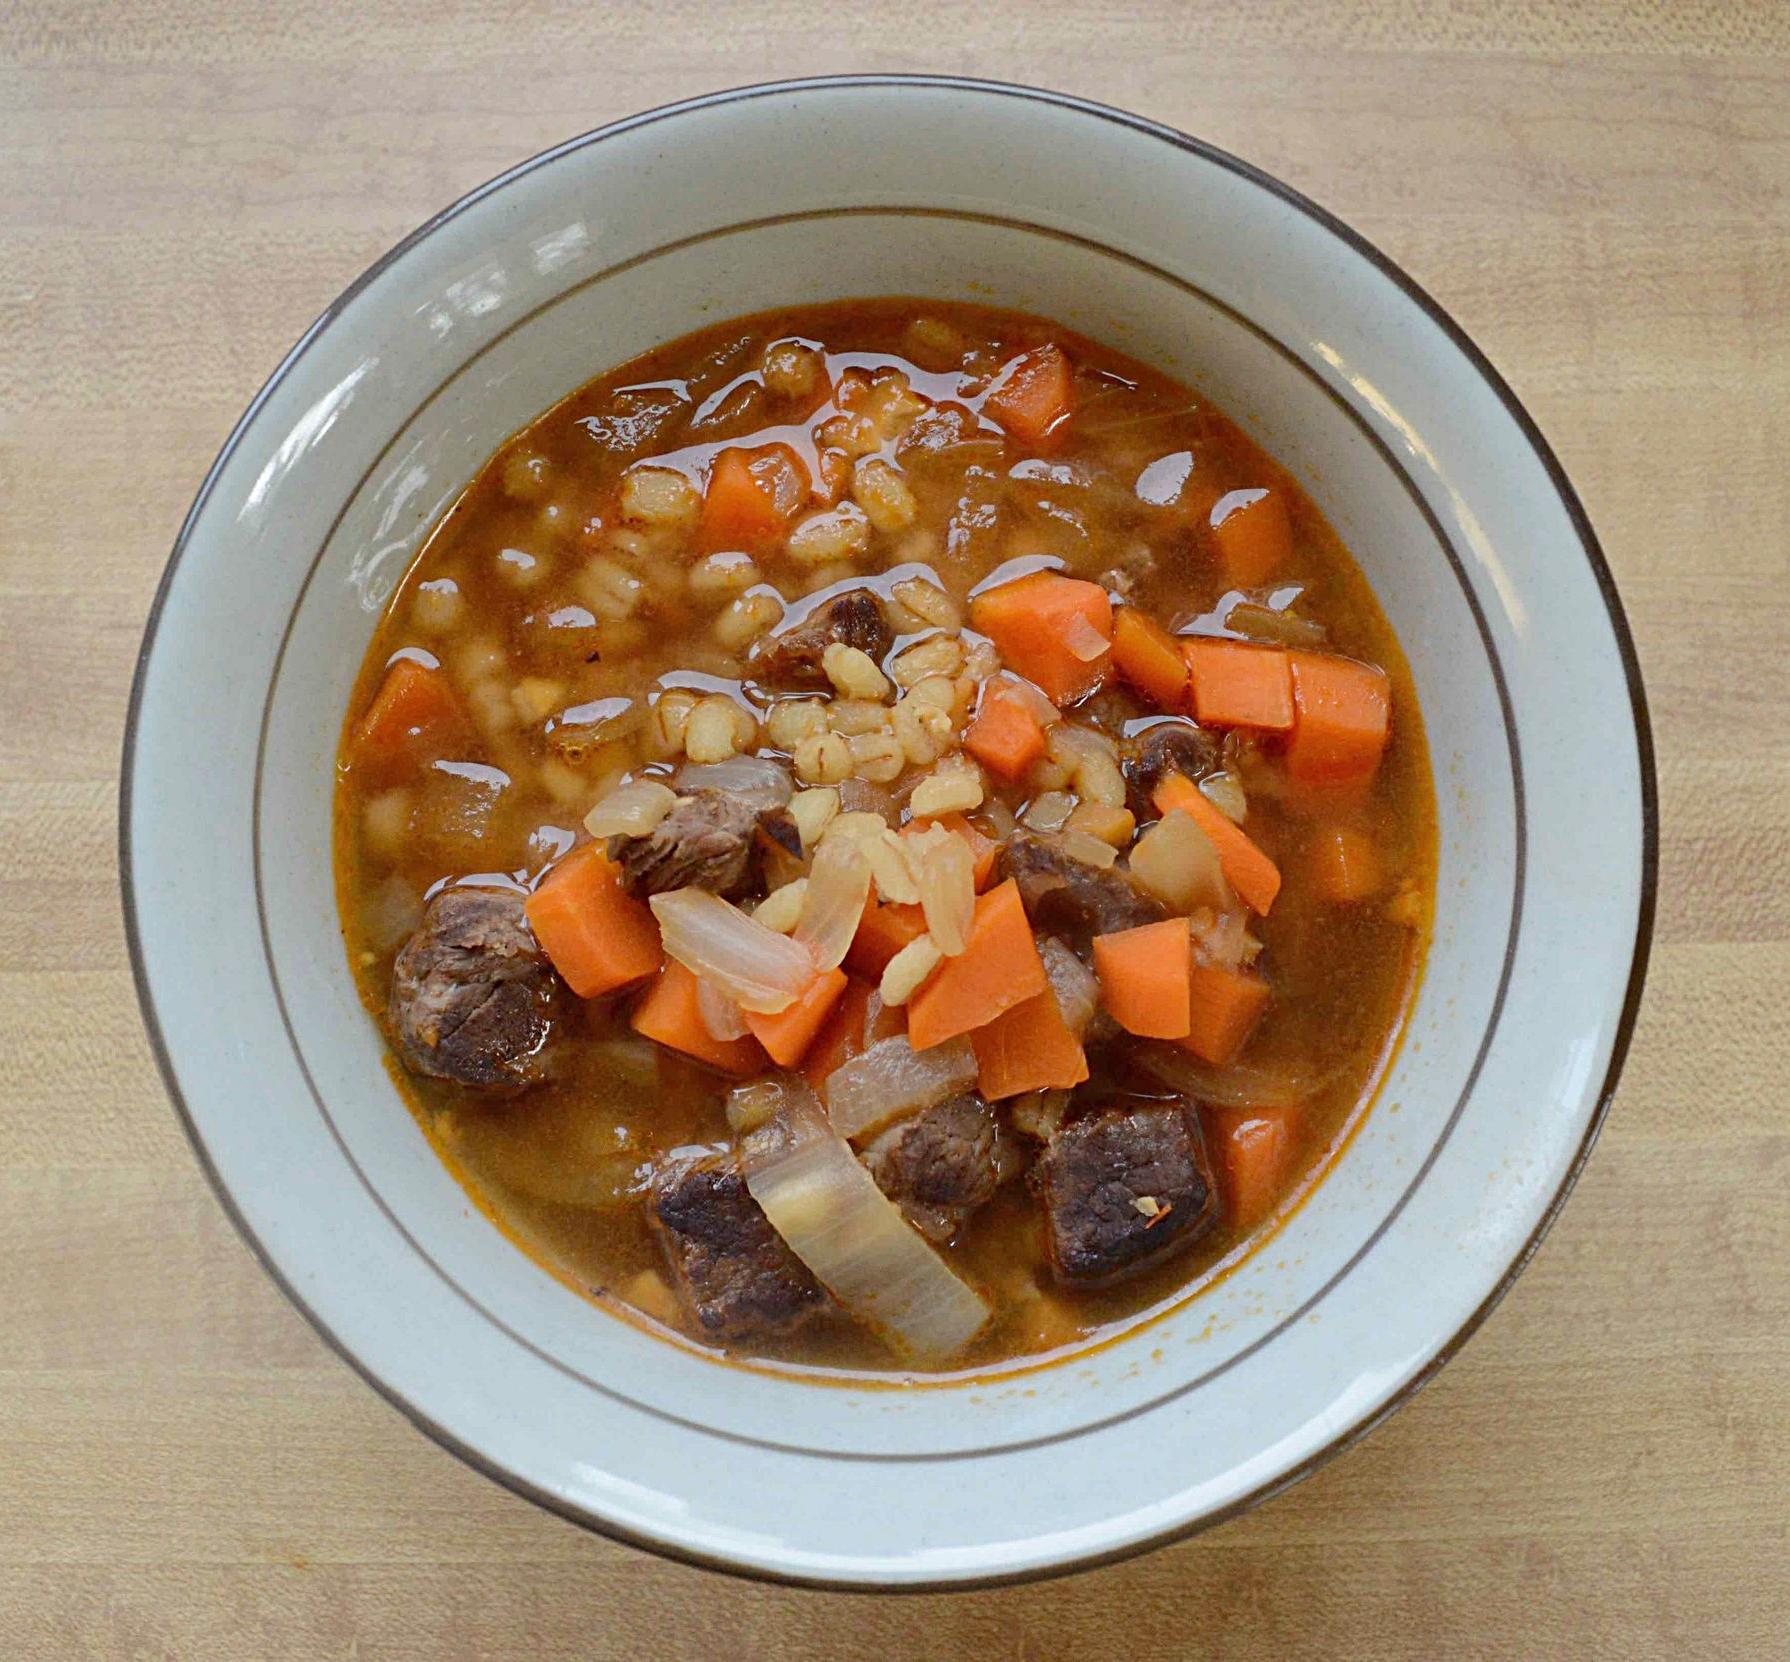 Weeknight Beef and Barley Soup